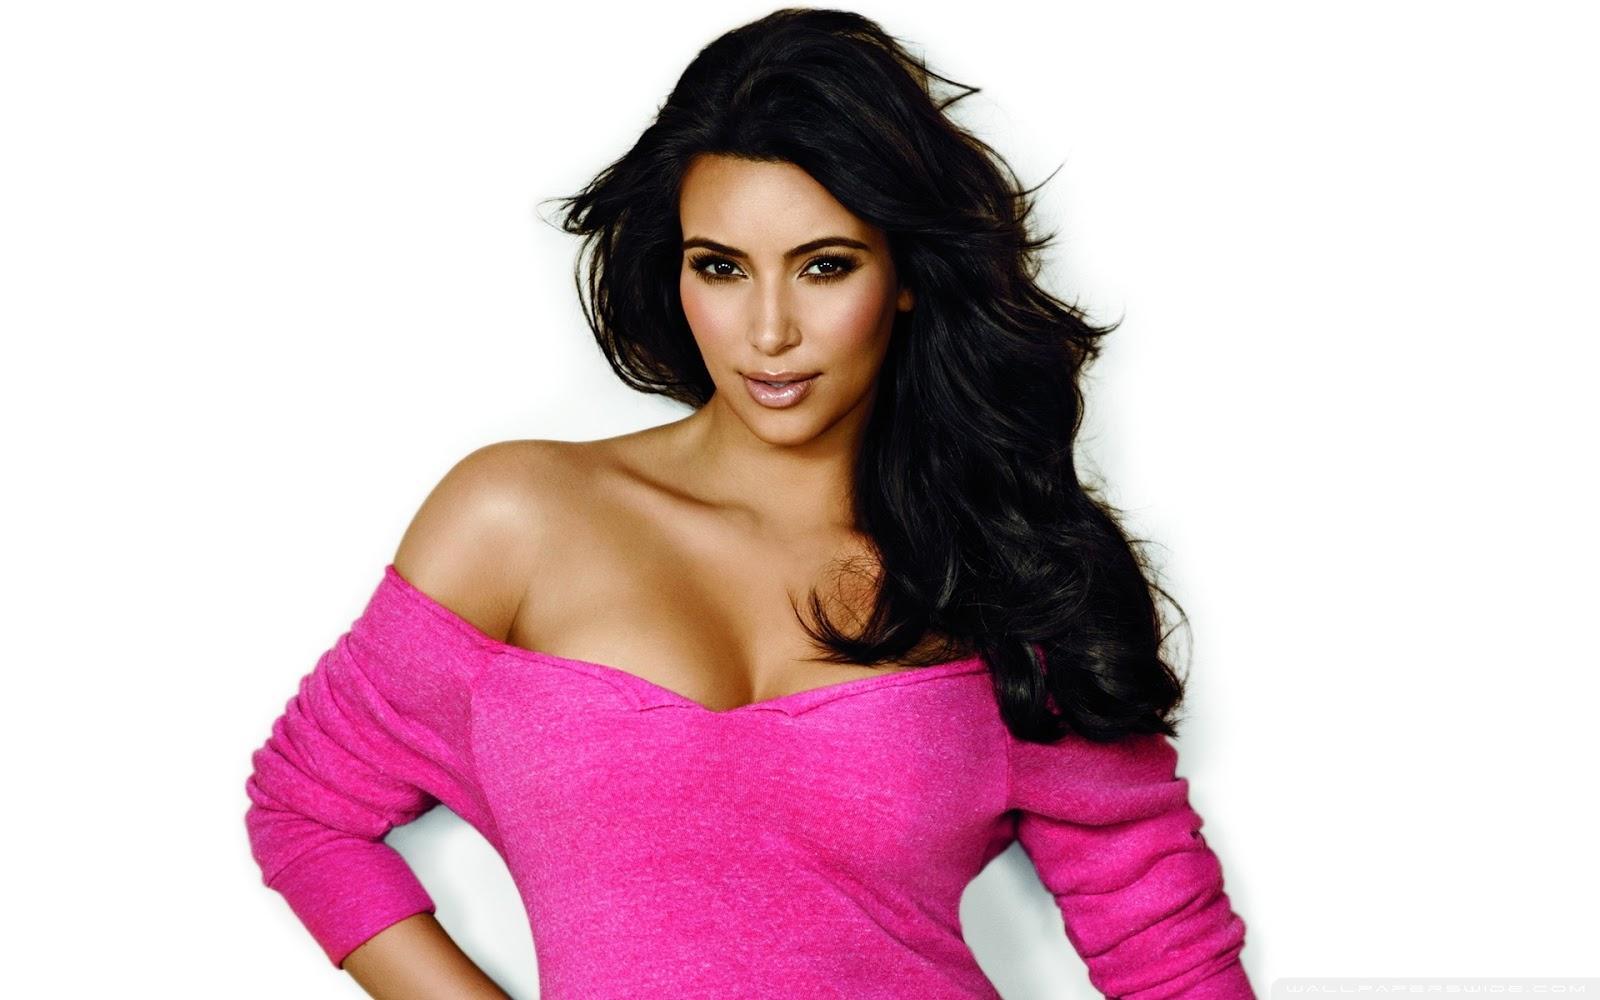 http://4.bp.blogspot.com/-4qBEUq_Qshk/UJi-Jl_DkHI/AAAAAAAACEo/EpYByikVI10/s1600/kim_kardashian.jpg